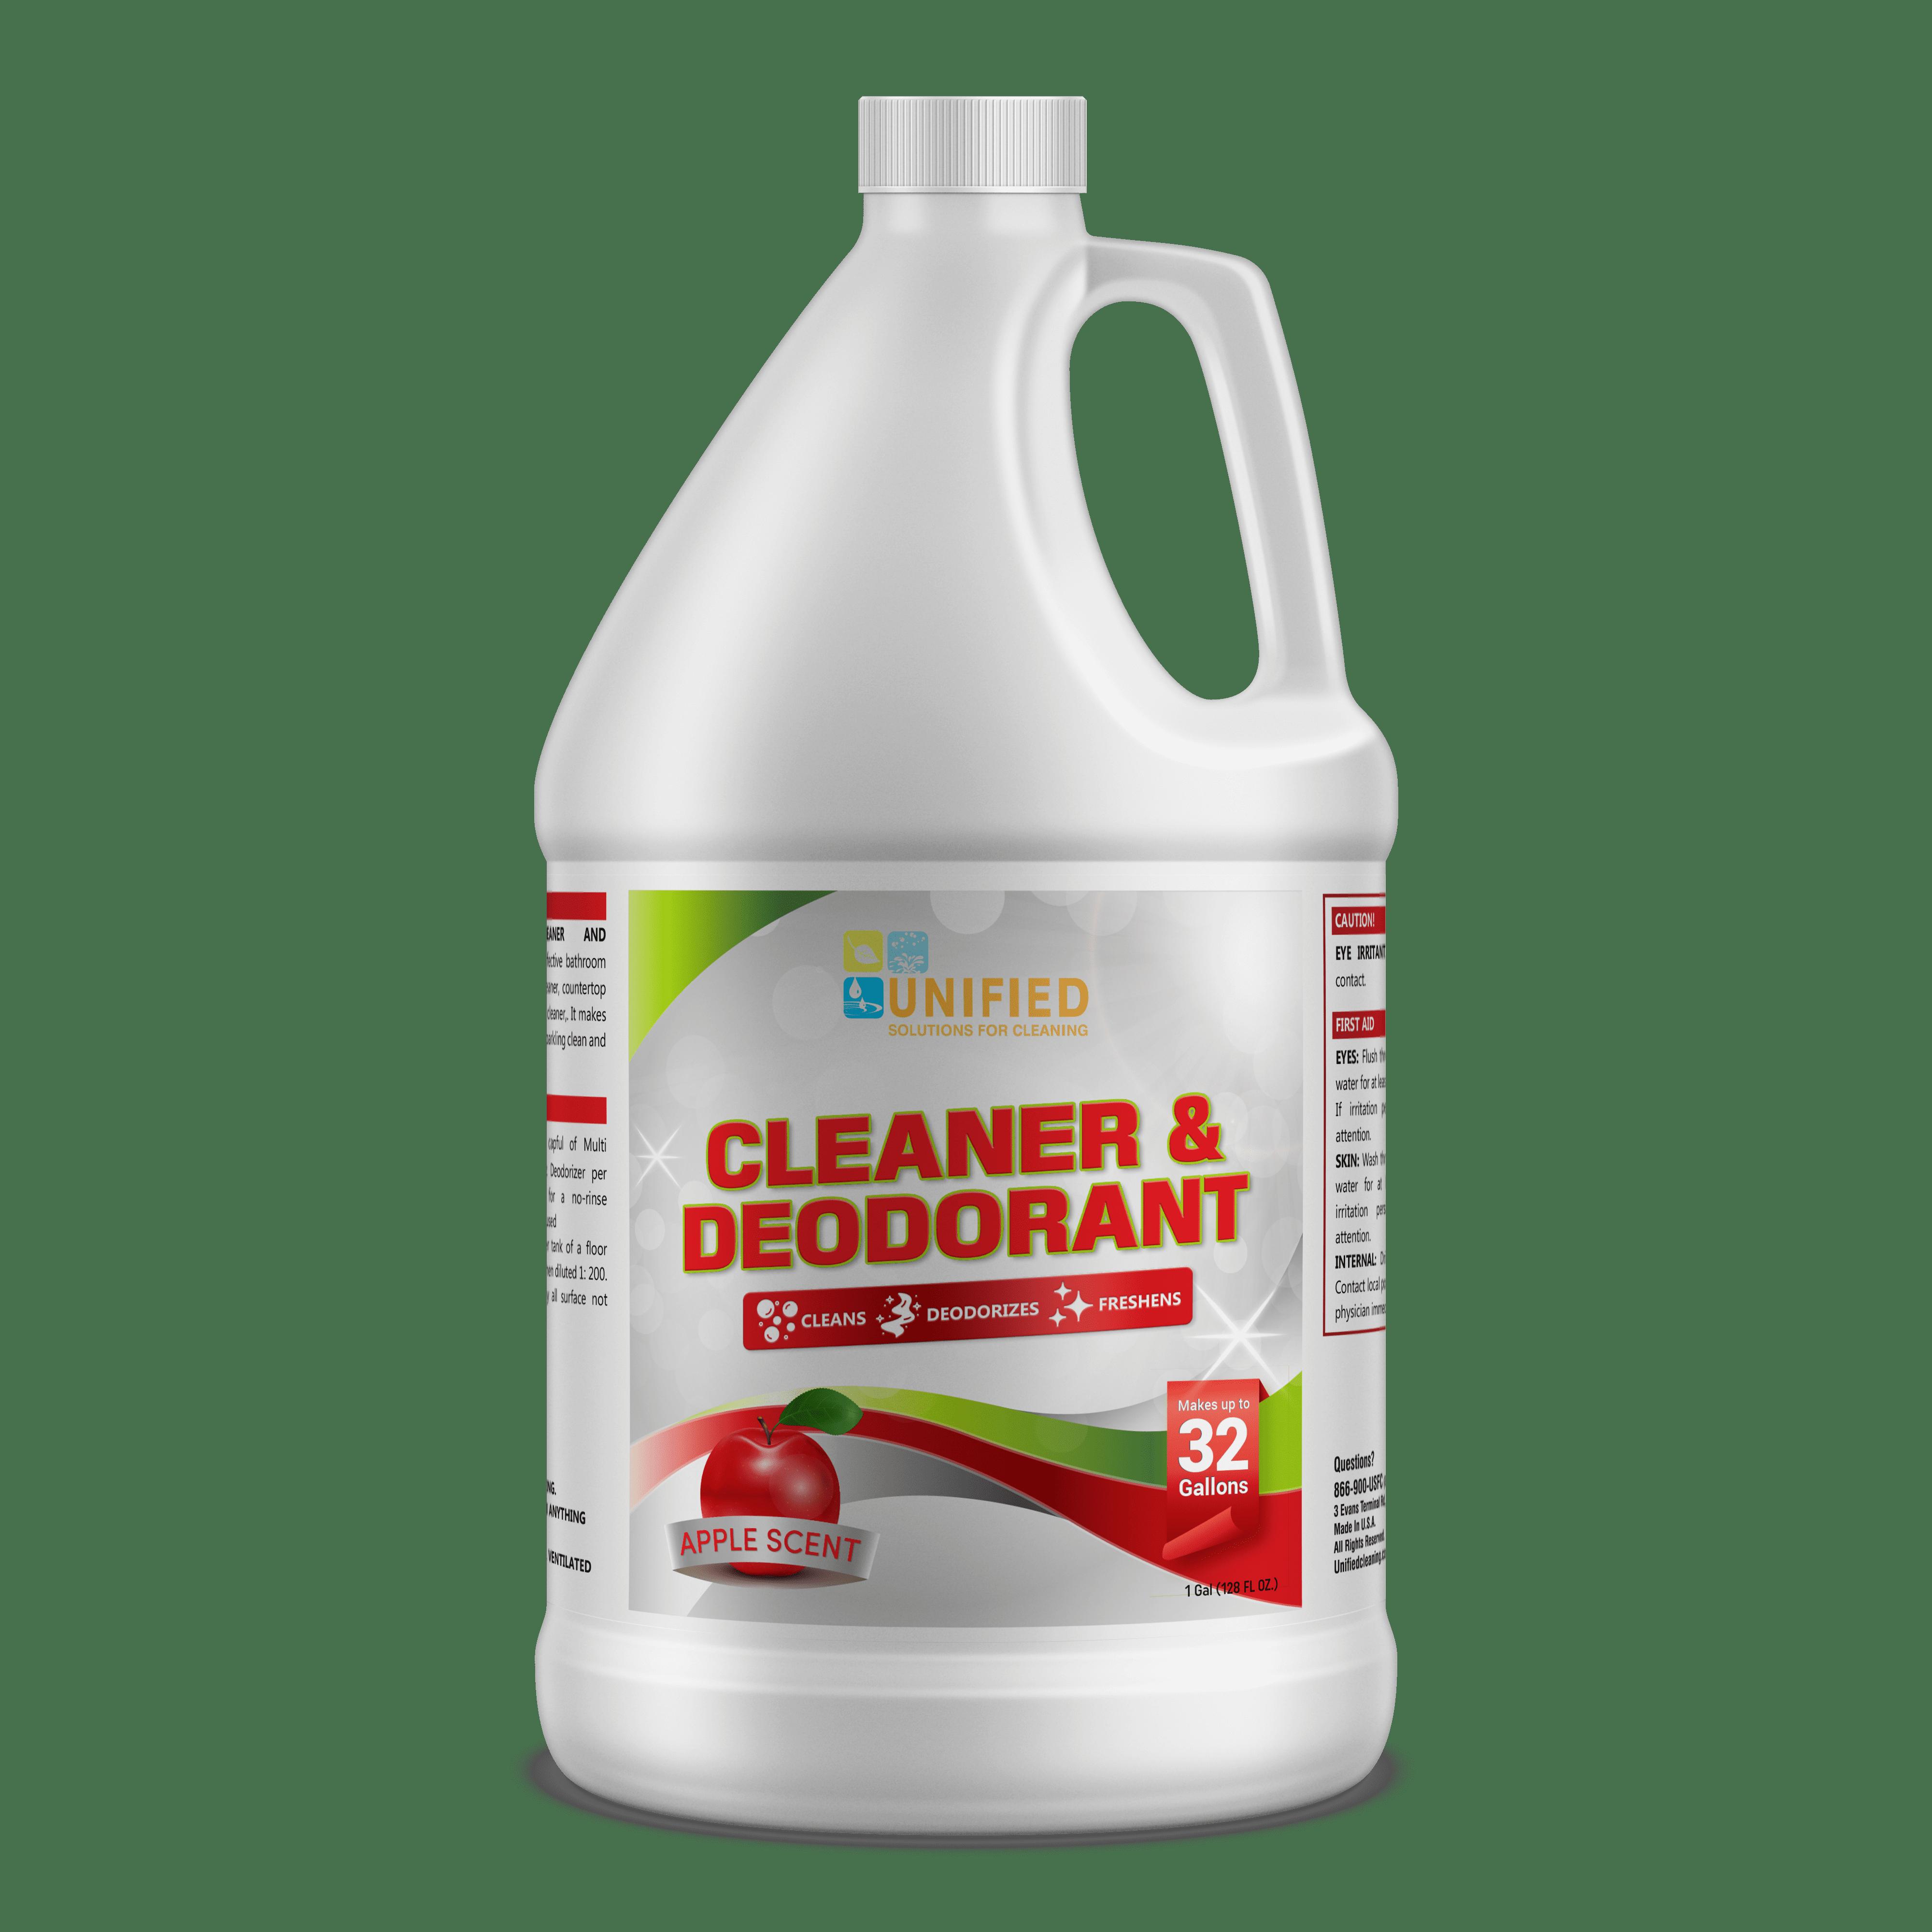 Apple Cleaner and deodorant